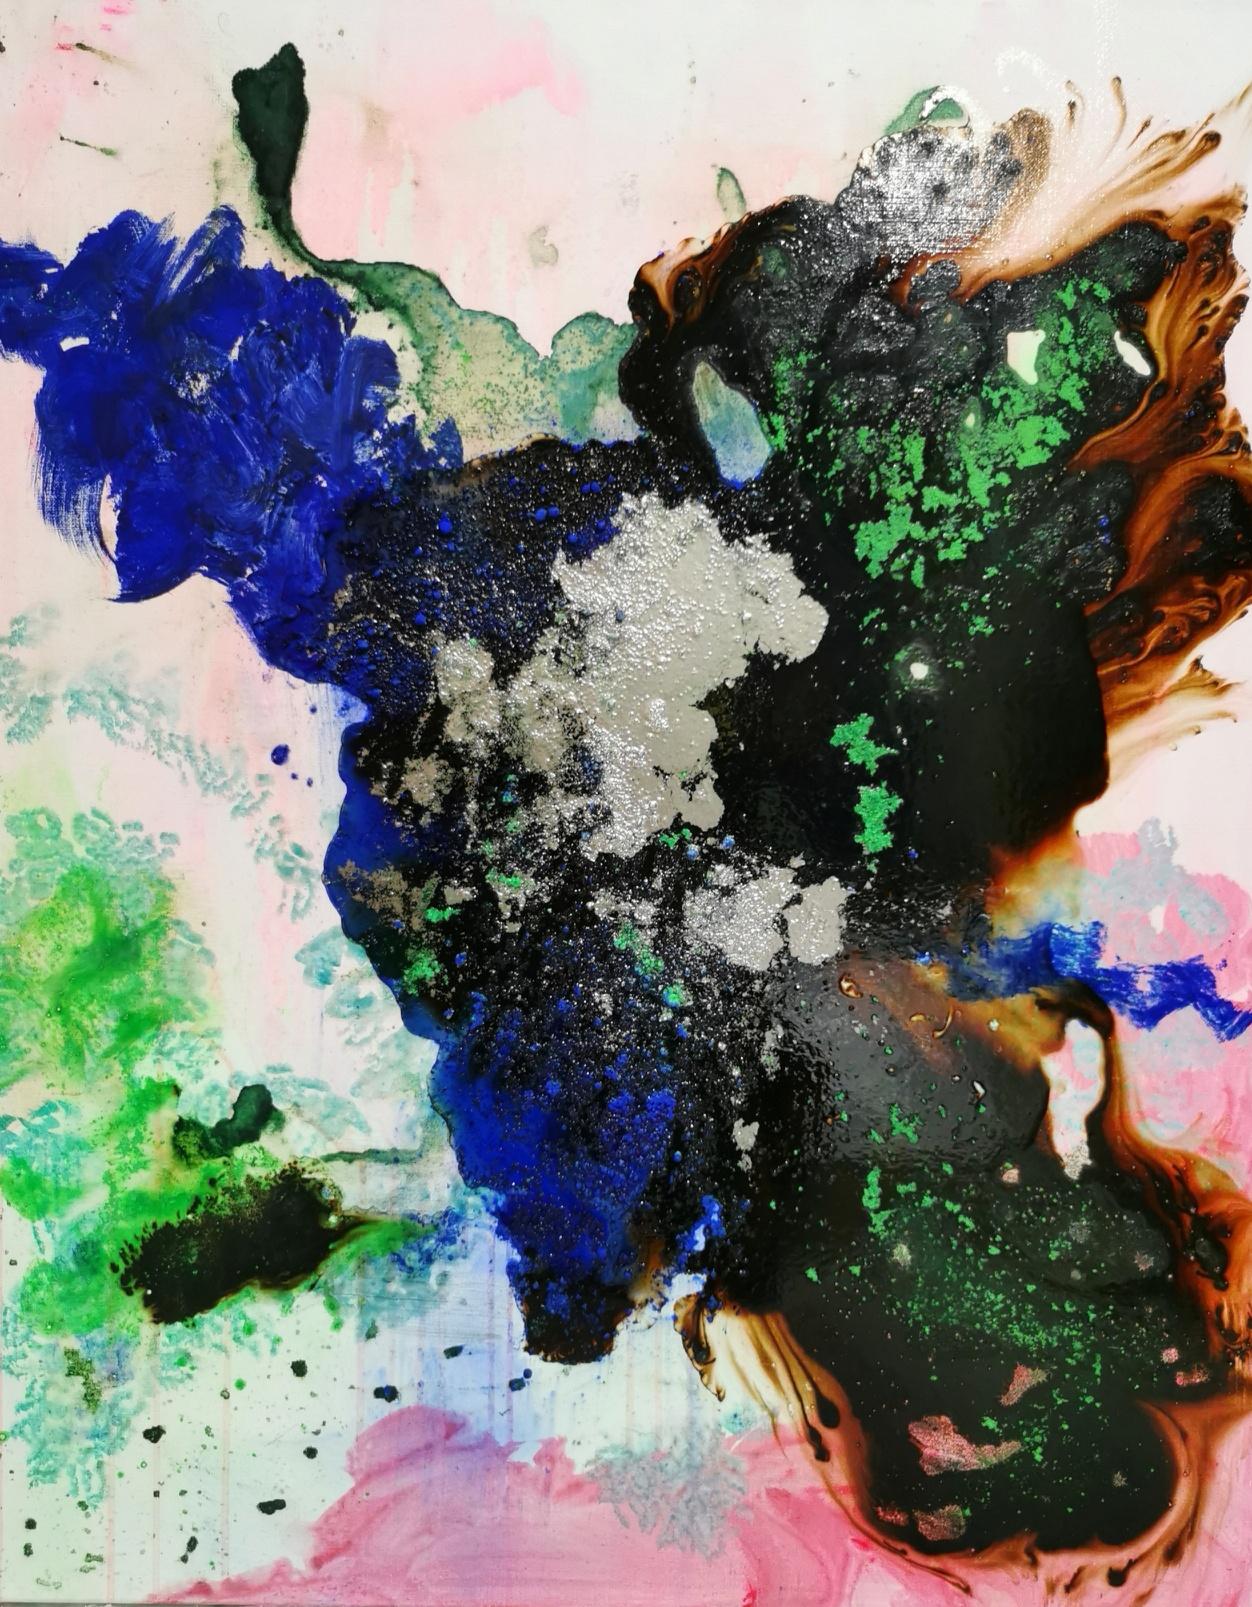 Fusion moka bleu et rose.92 x 73 cm